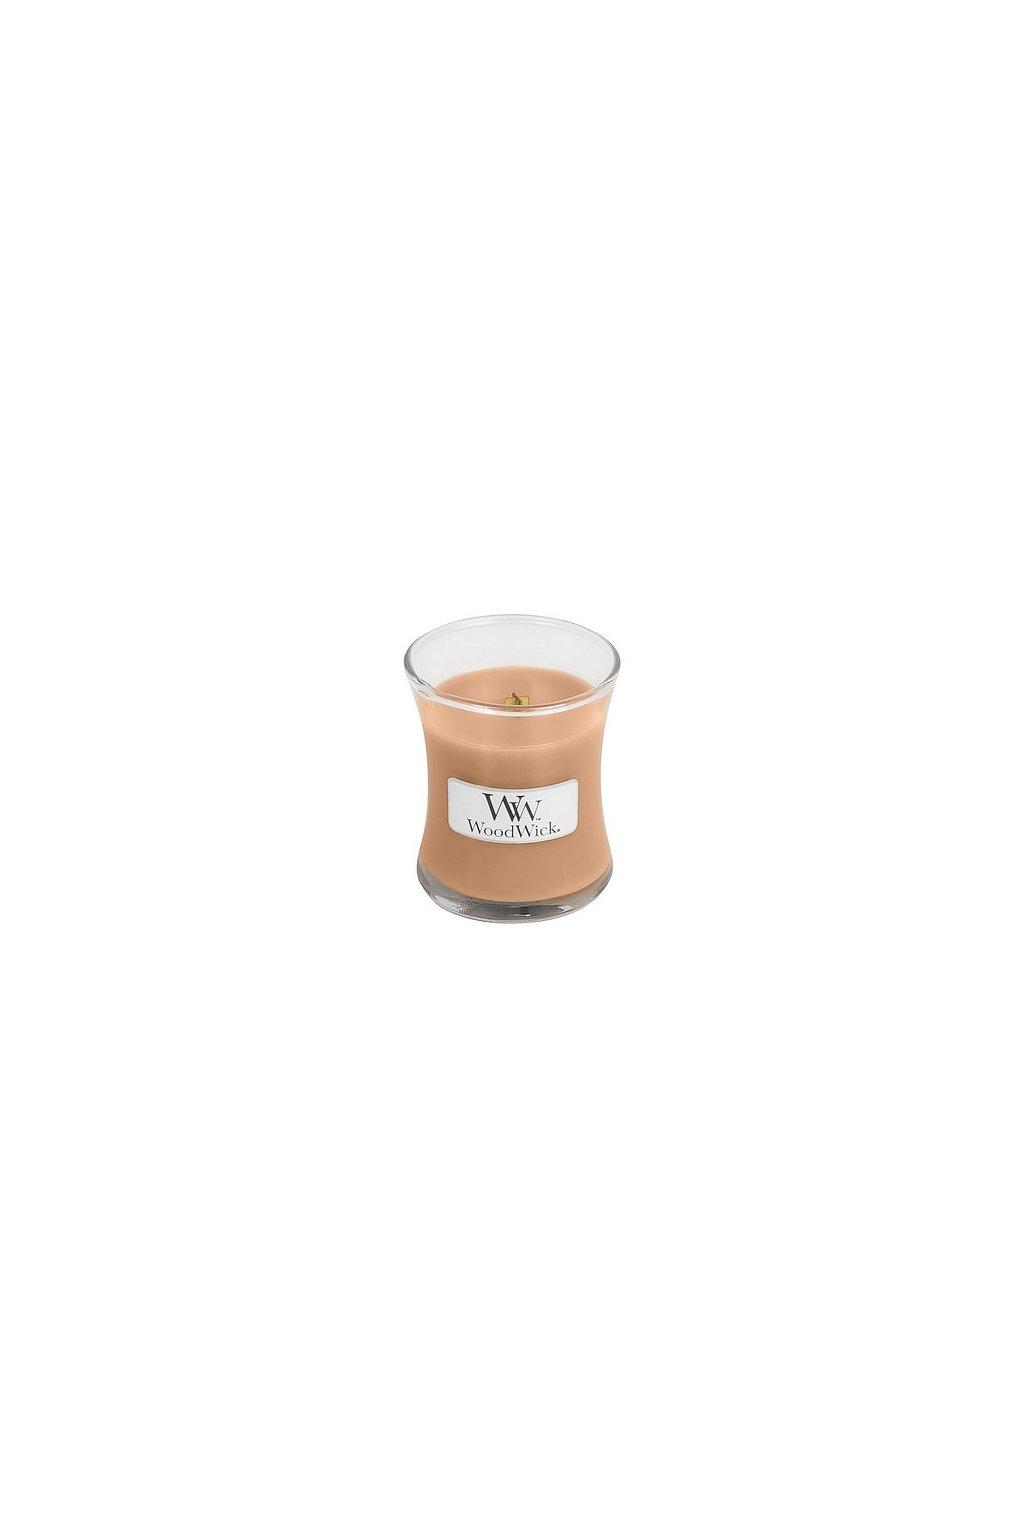 WoodWick Golden Milk svíčka malá 85g